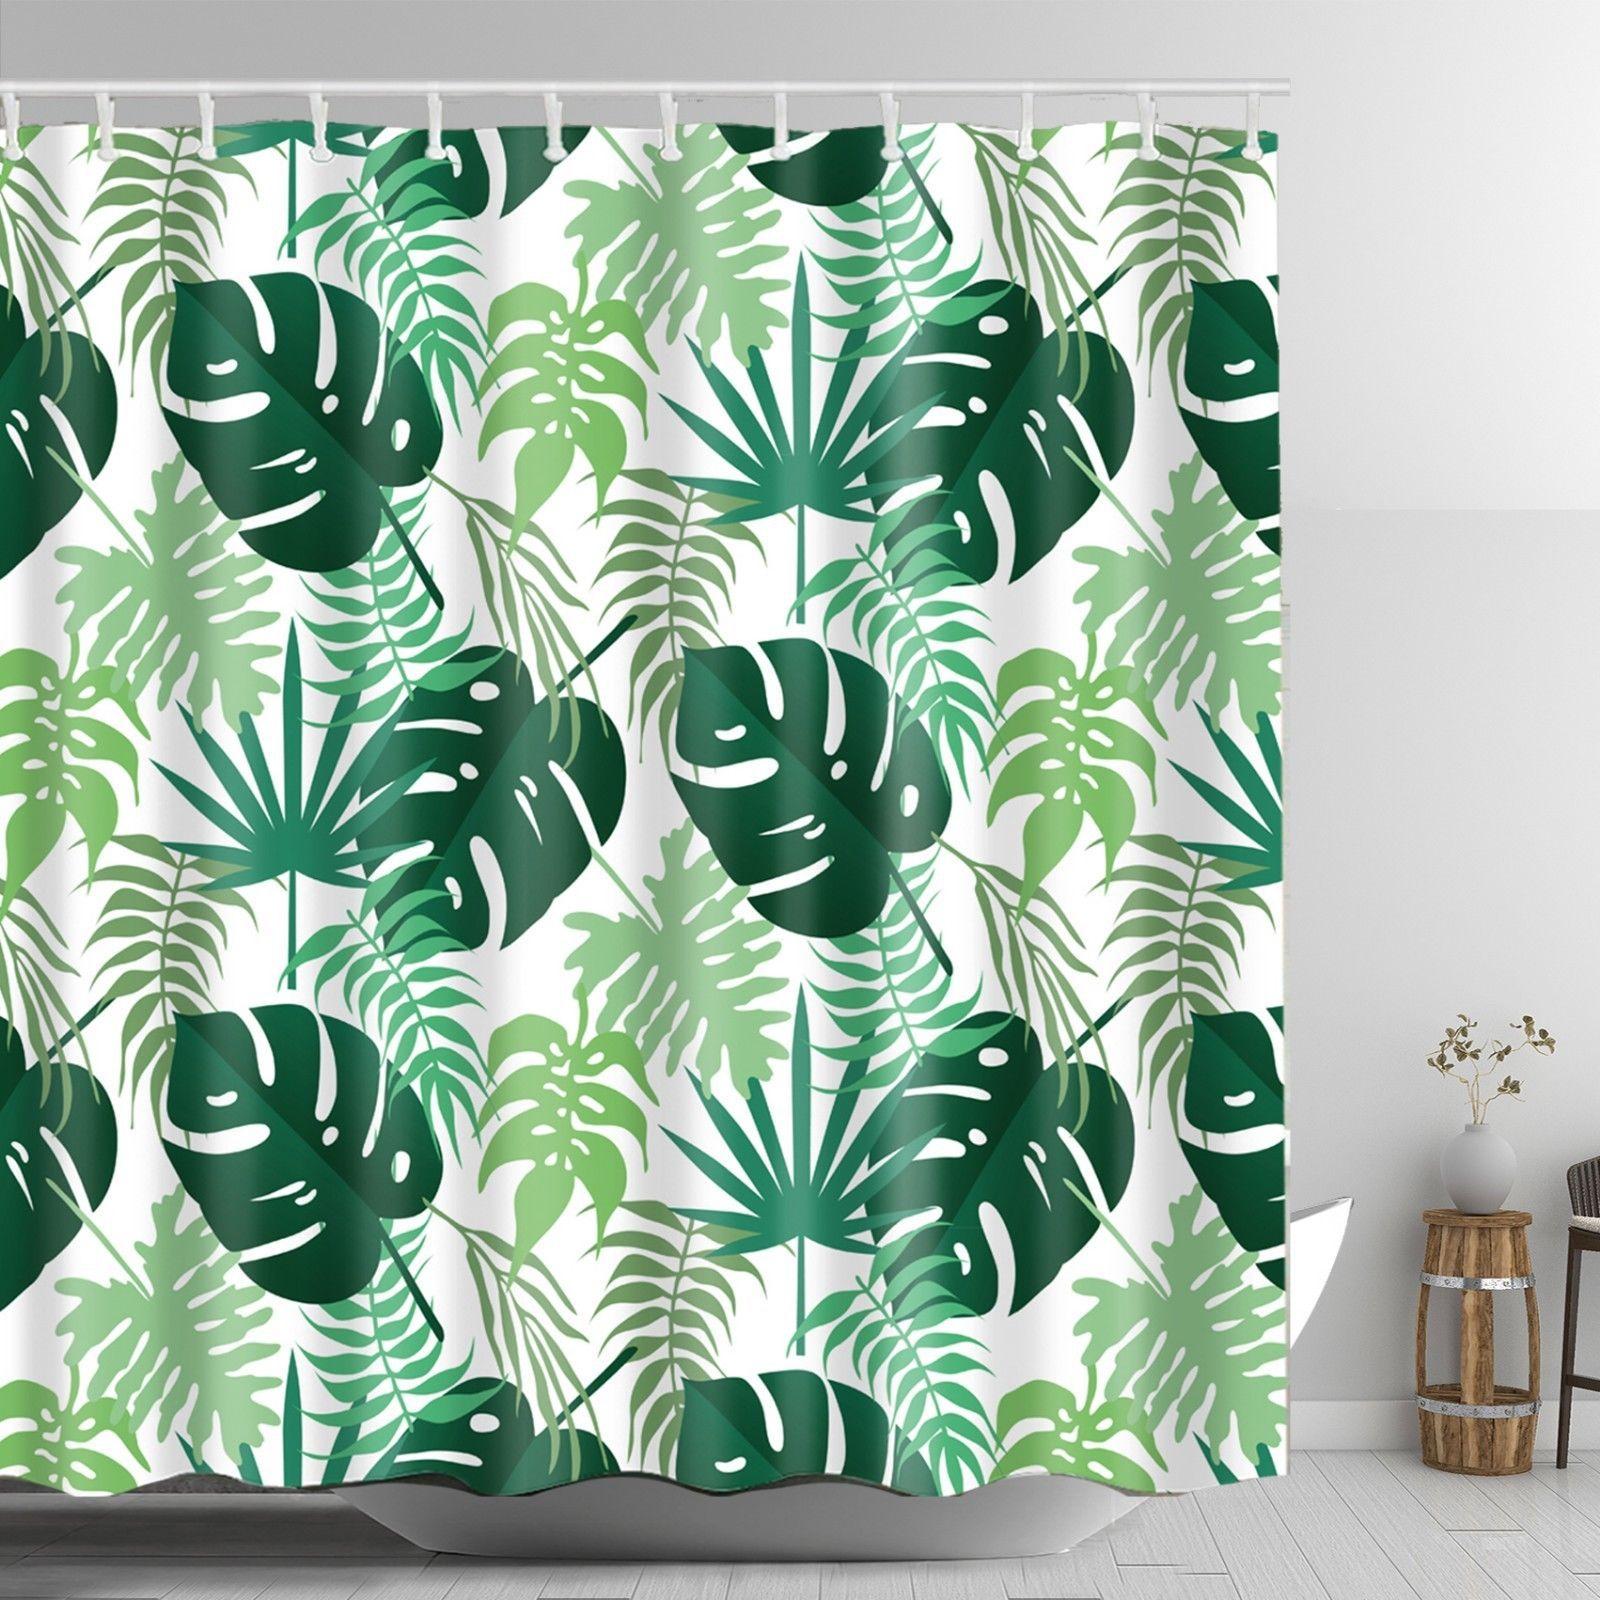 Green Tropical Leaves Shower Curtain Fabric Bathroom Decor Washable With Hooks Bathroom Decor Fabric Shower Curtains Curtains